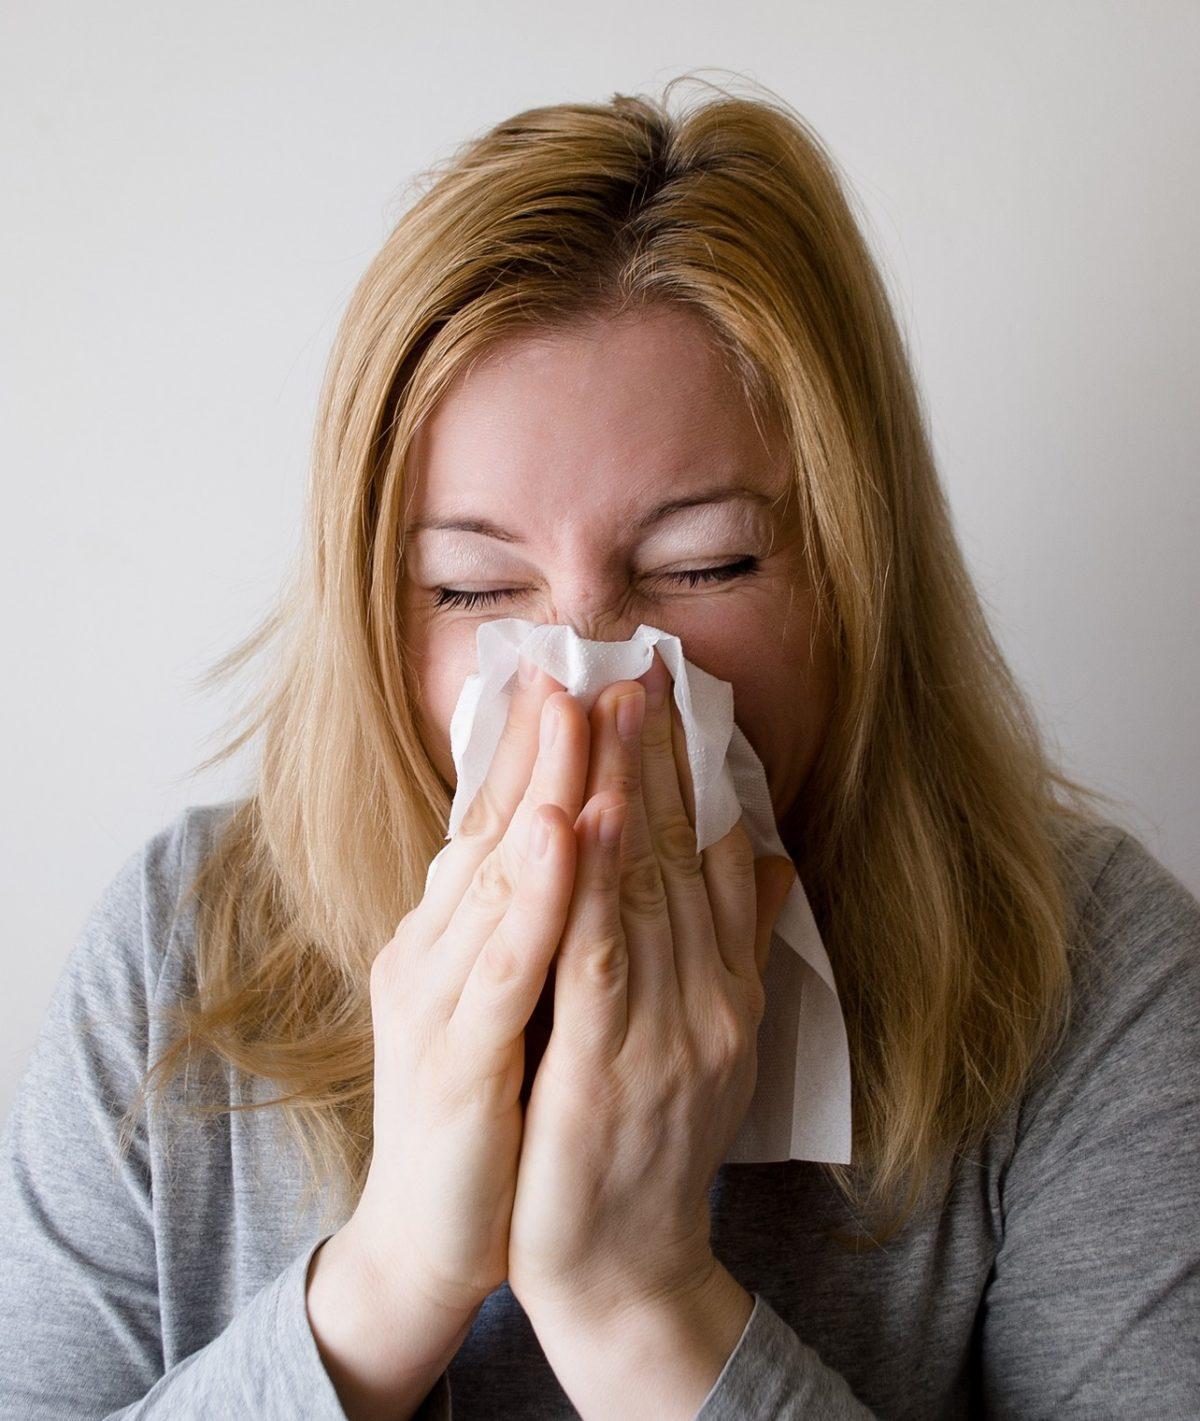 grippe pixabay